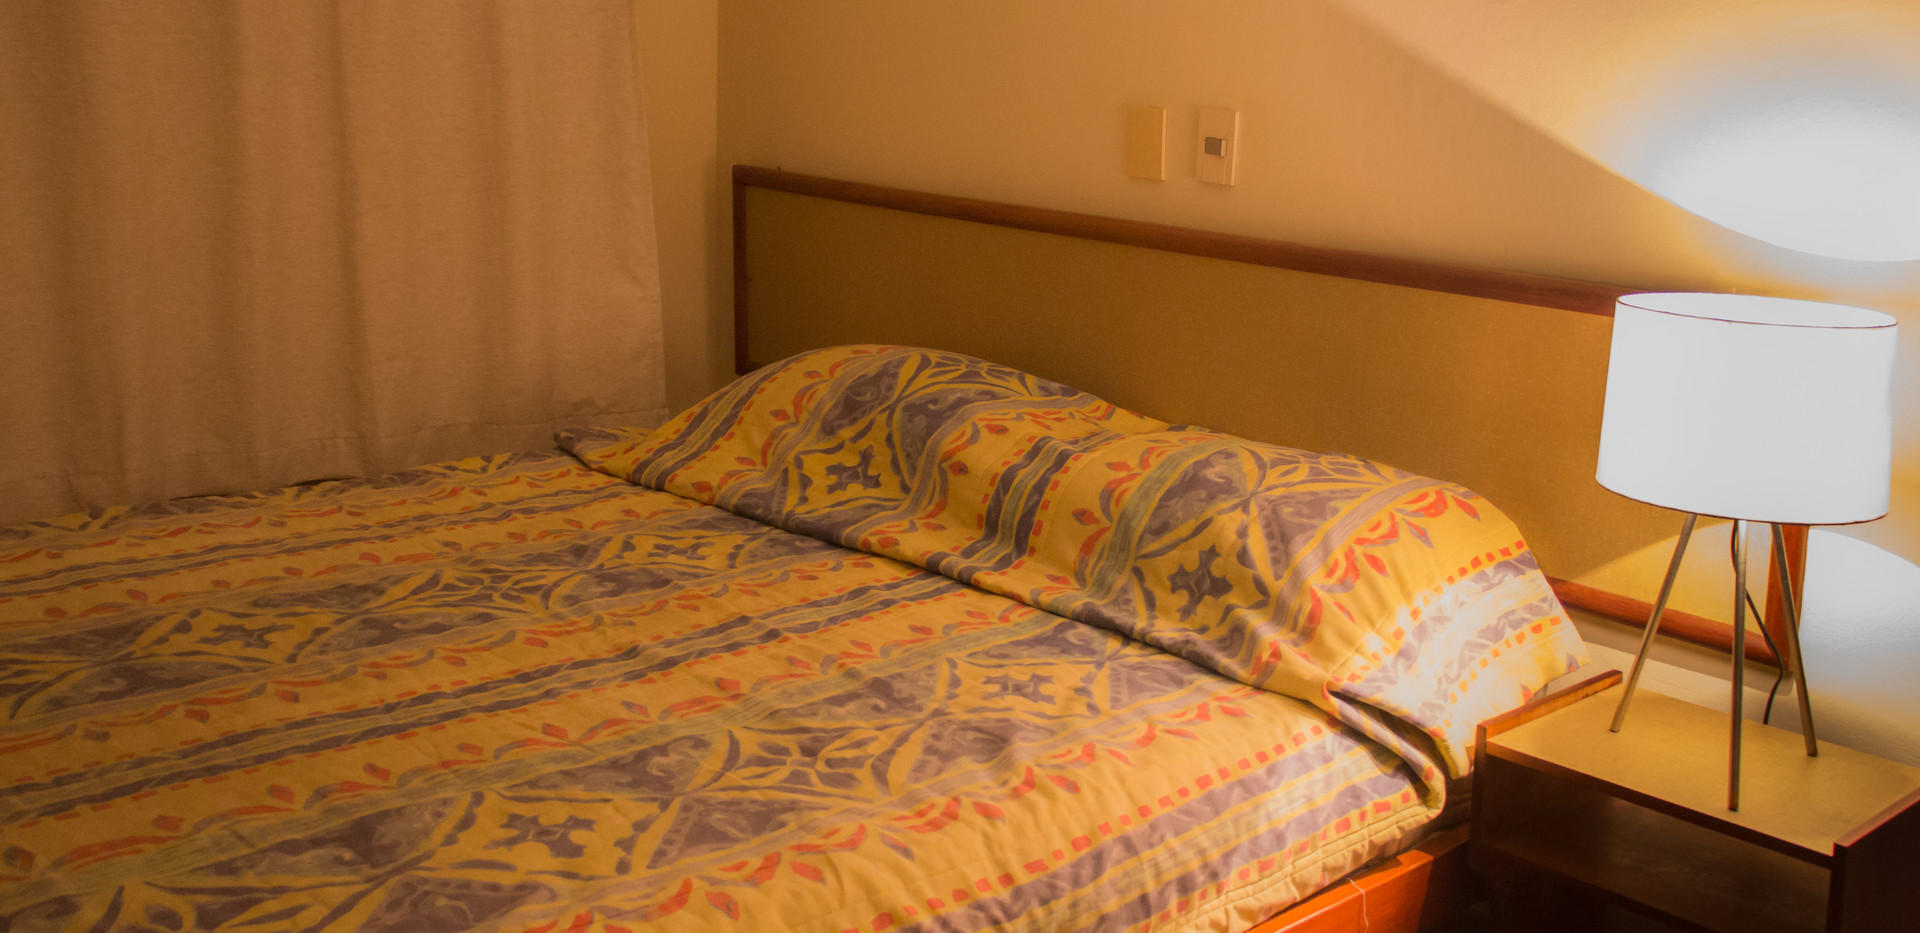 IMG_2904 quarto cama noturna 2.jpg